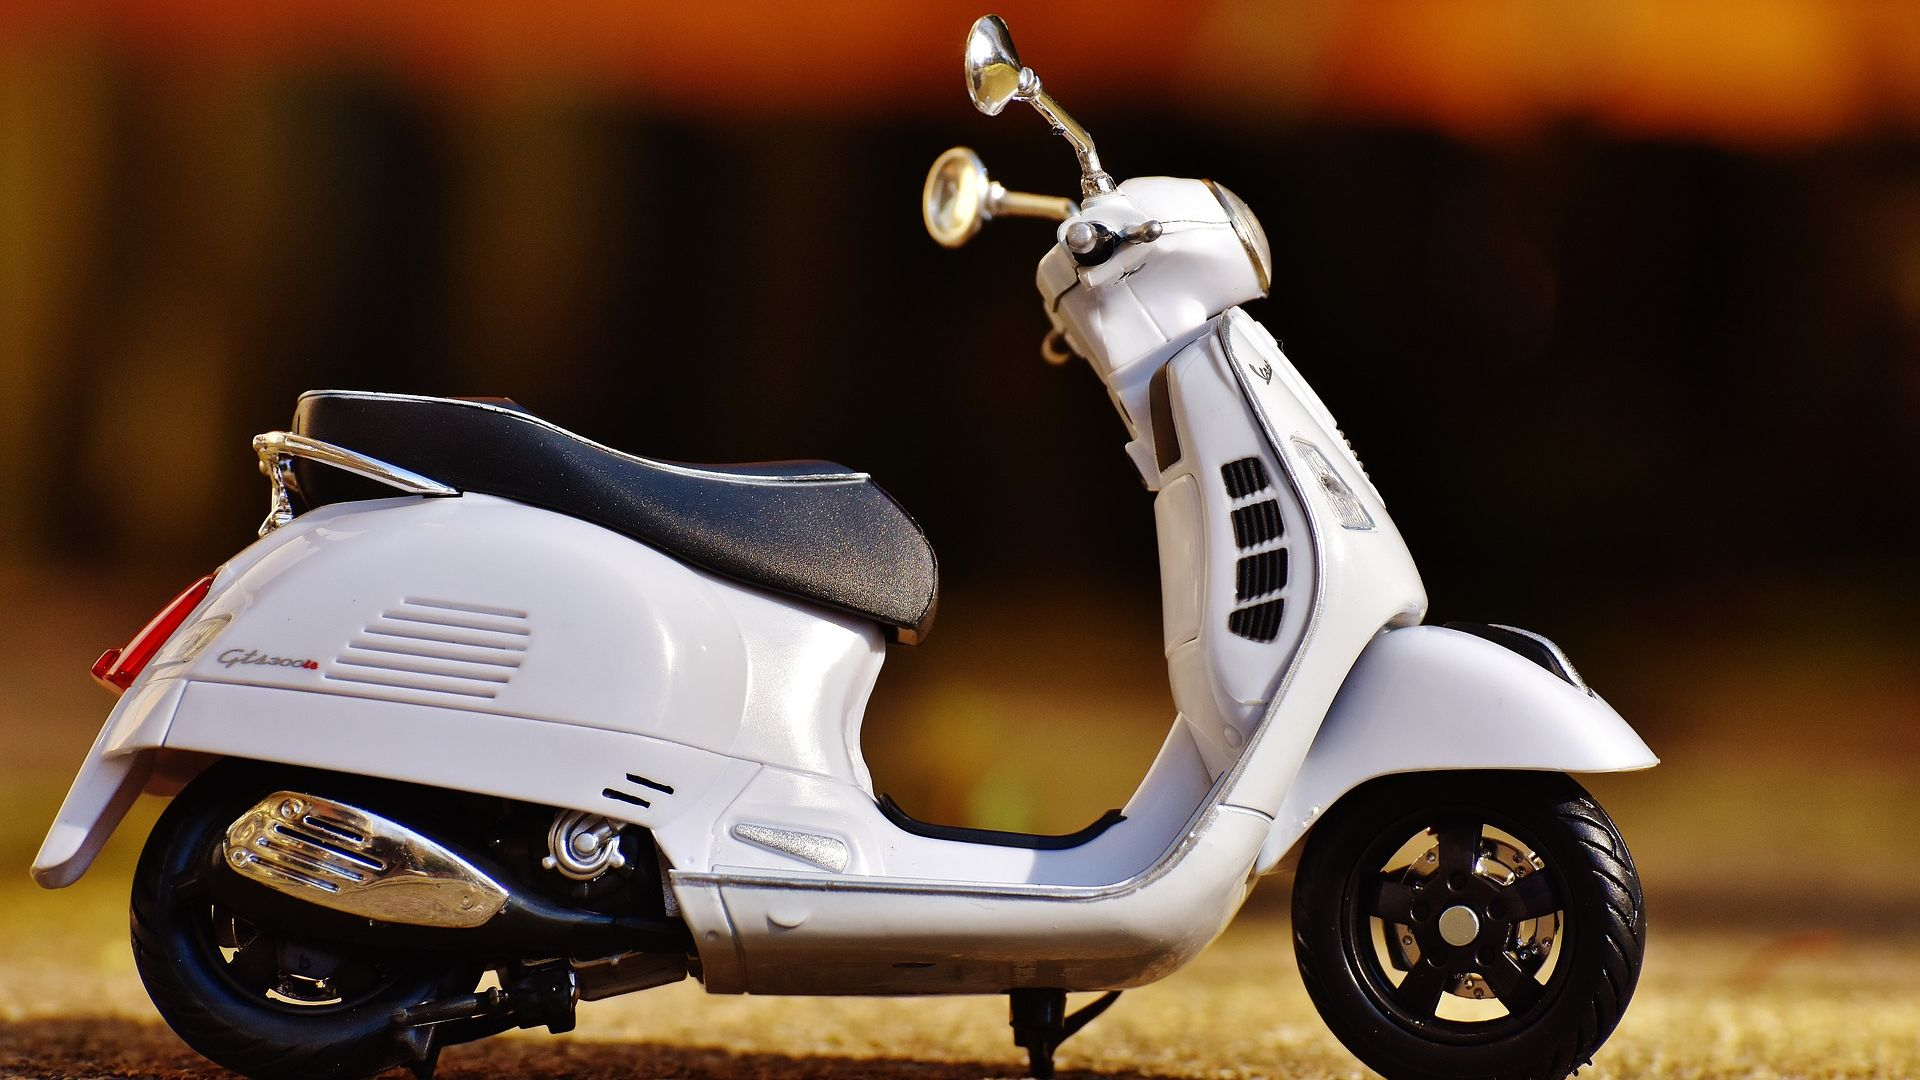 desktop wallpaper vespa bike model toy hd image picture